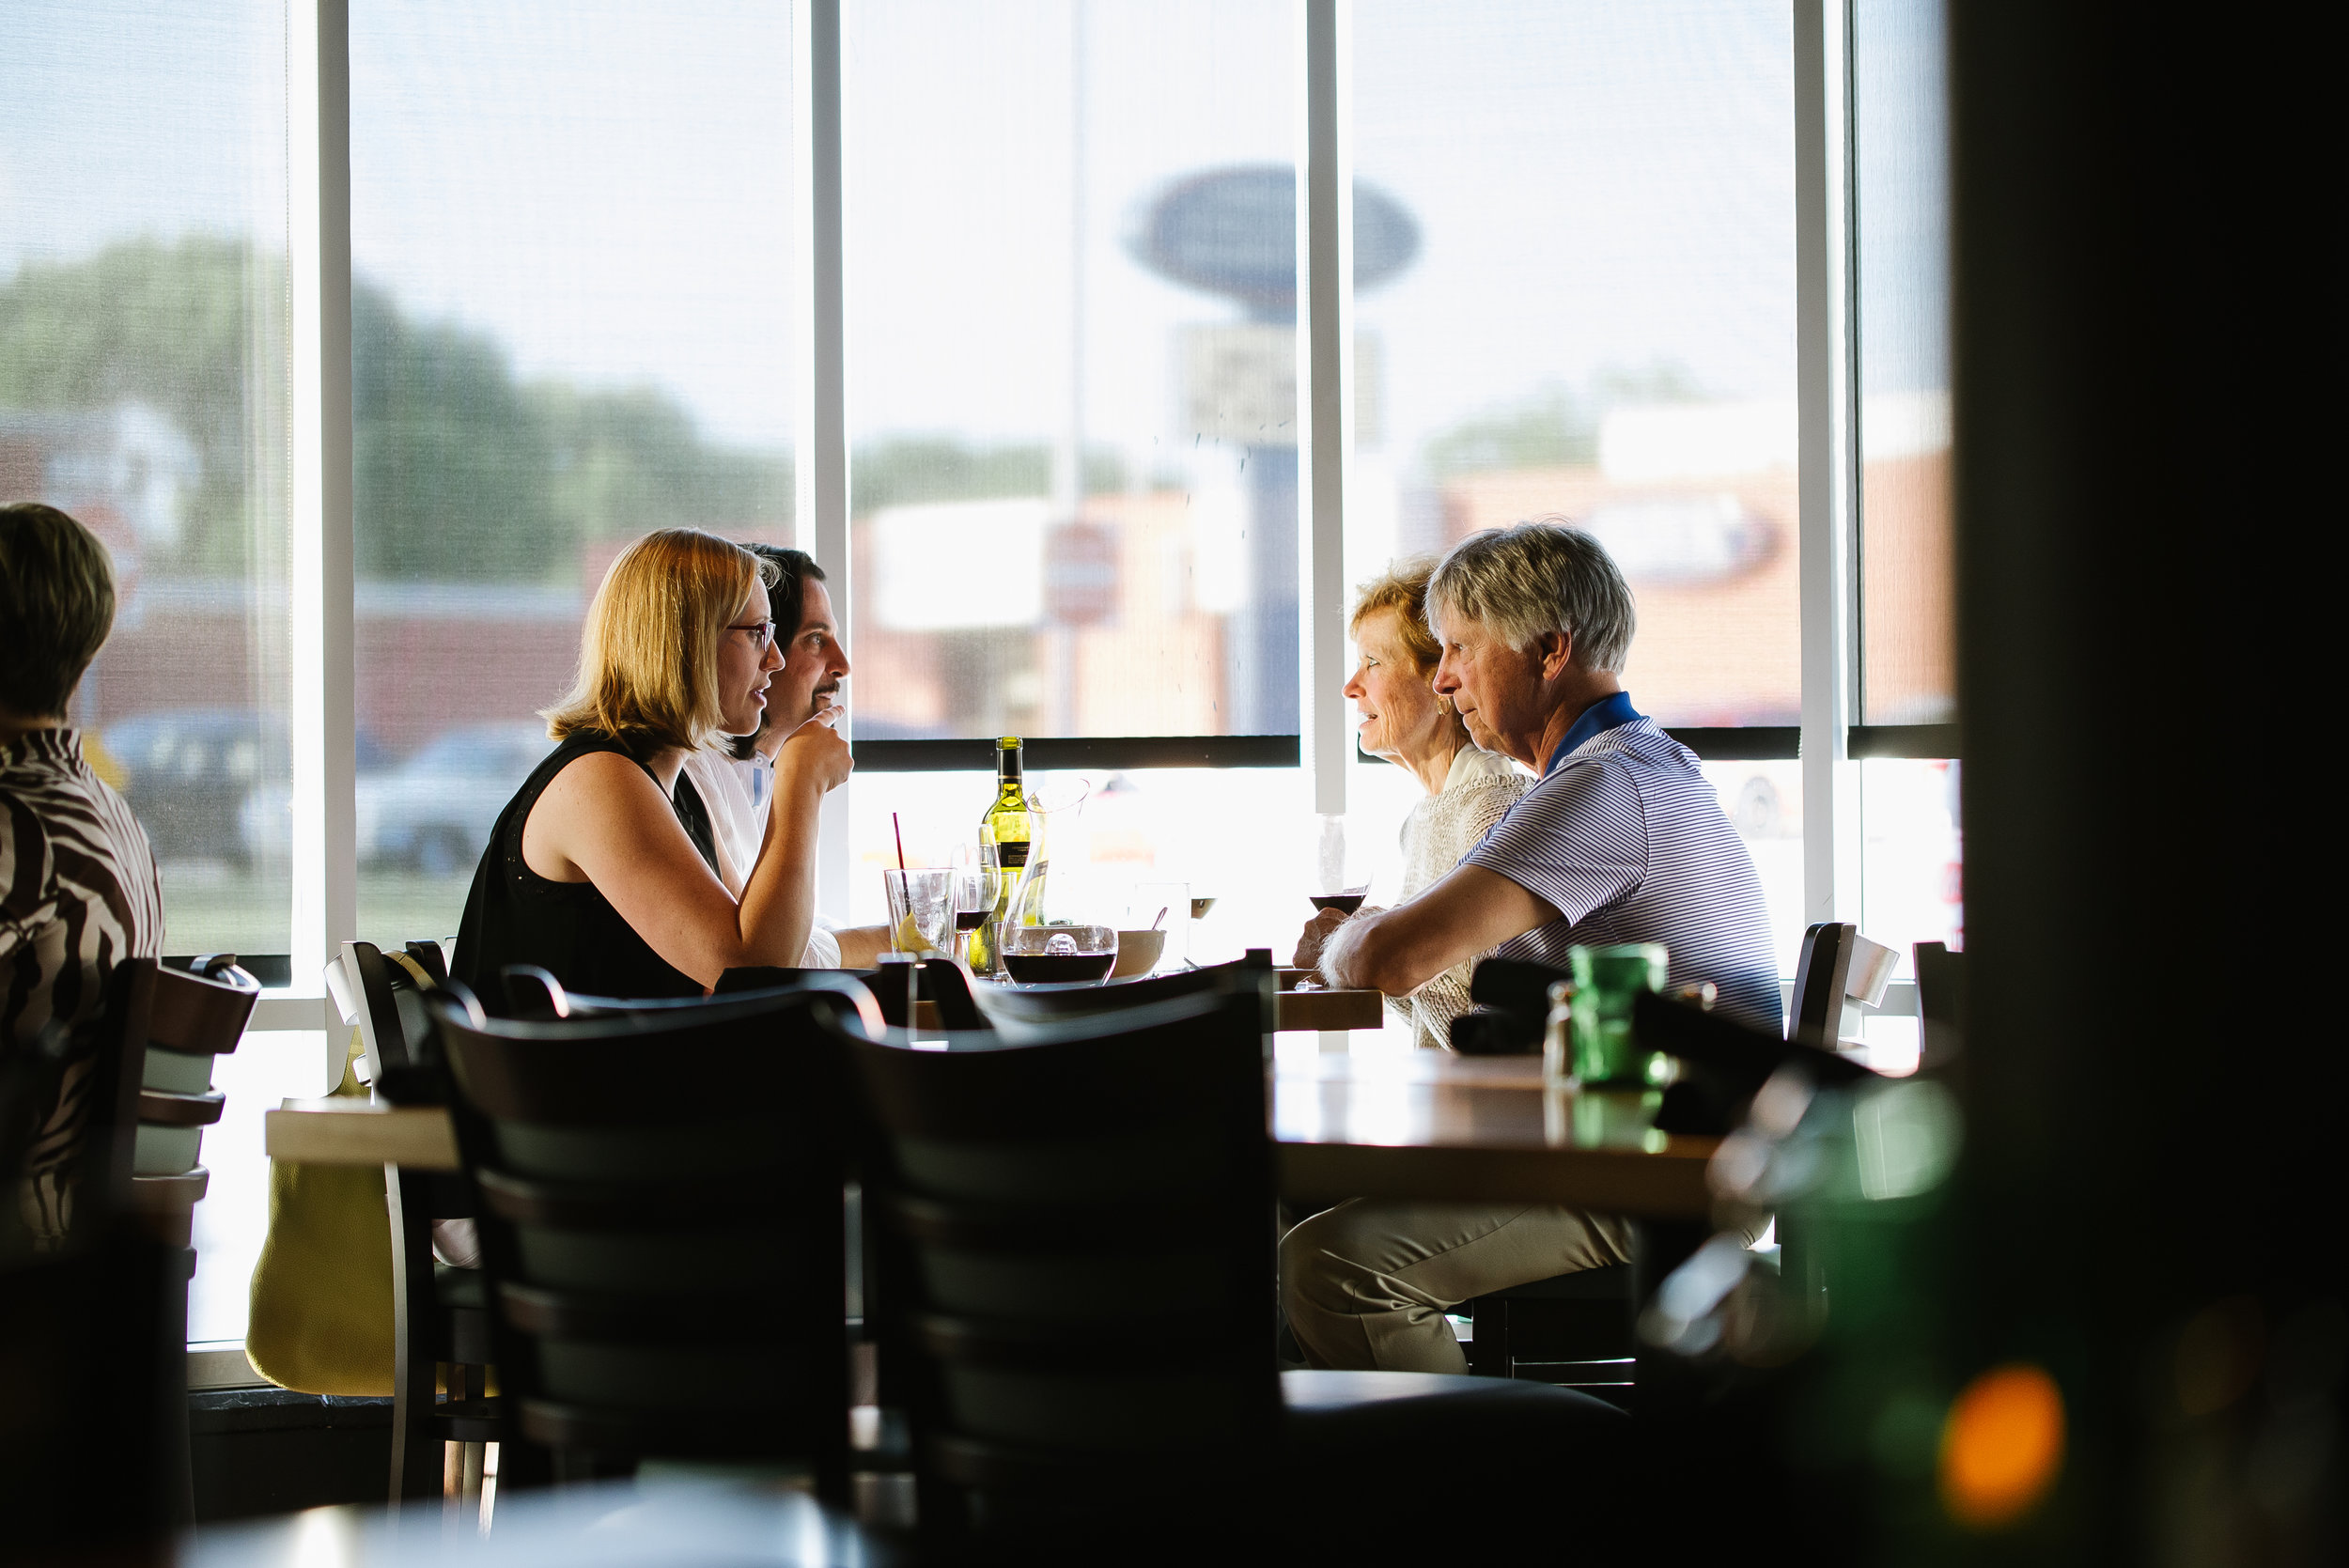 Alba Des Moines, Iowa Restaurant Table 4